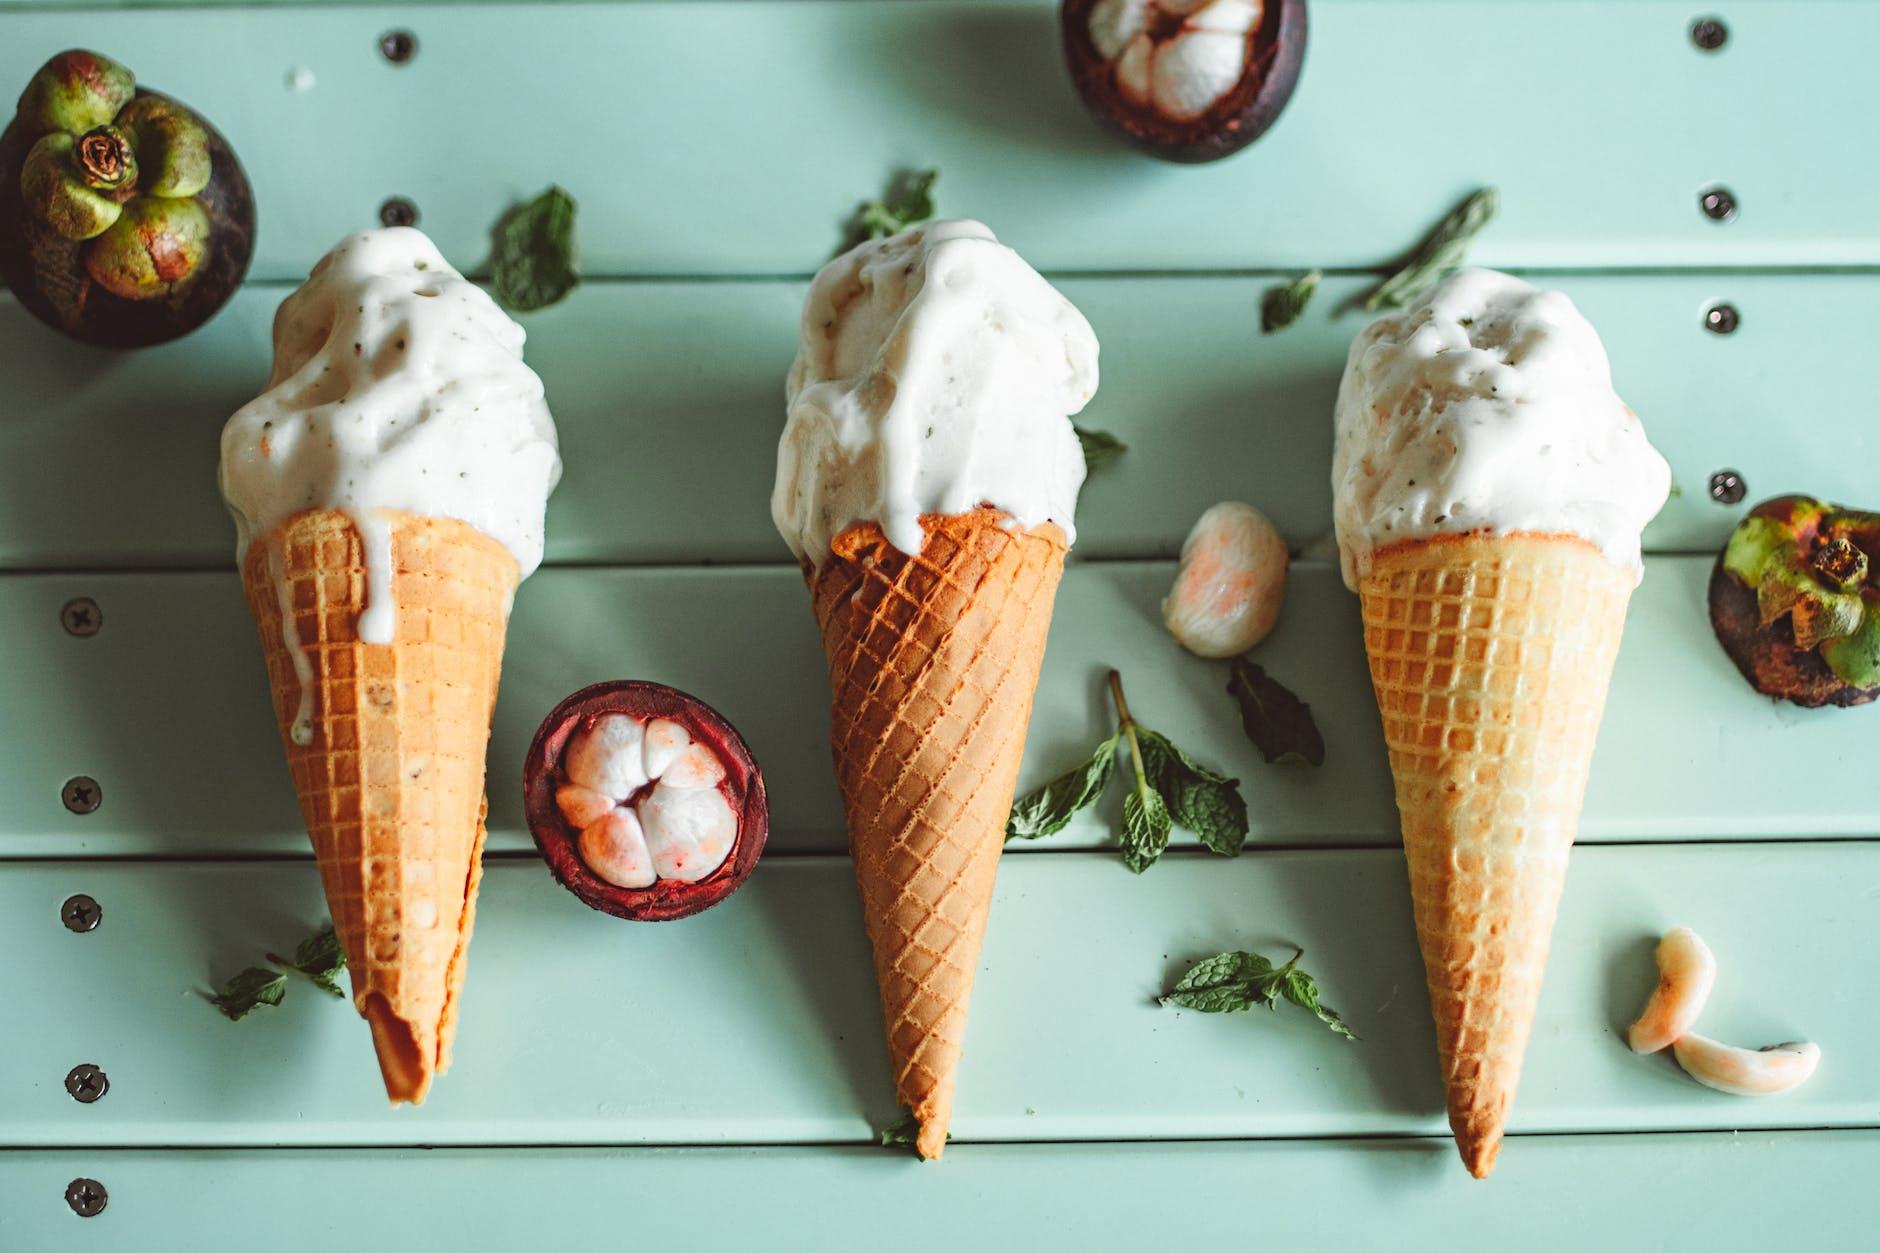 Multi-Unit Ice Cream Maker, Best Product in WNC